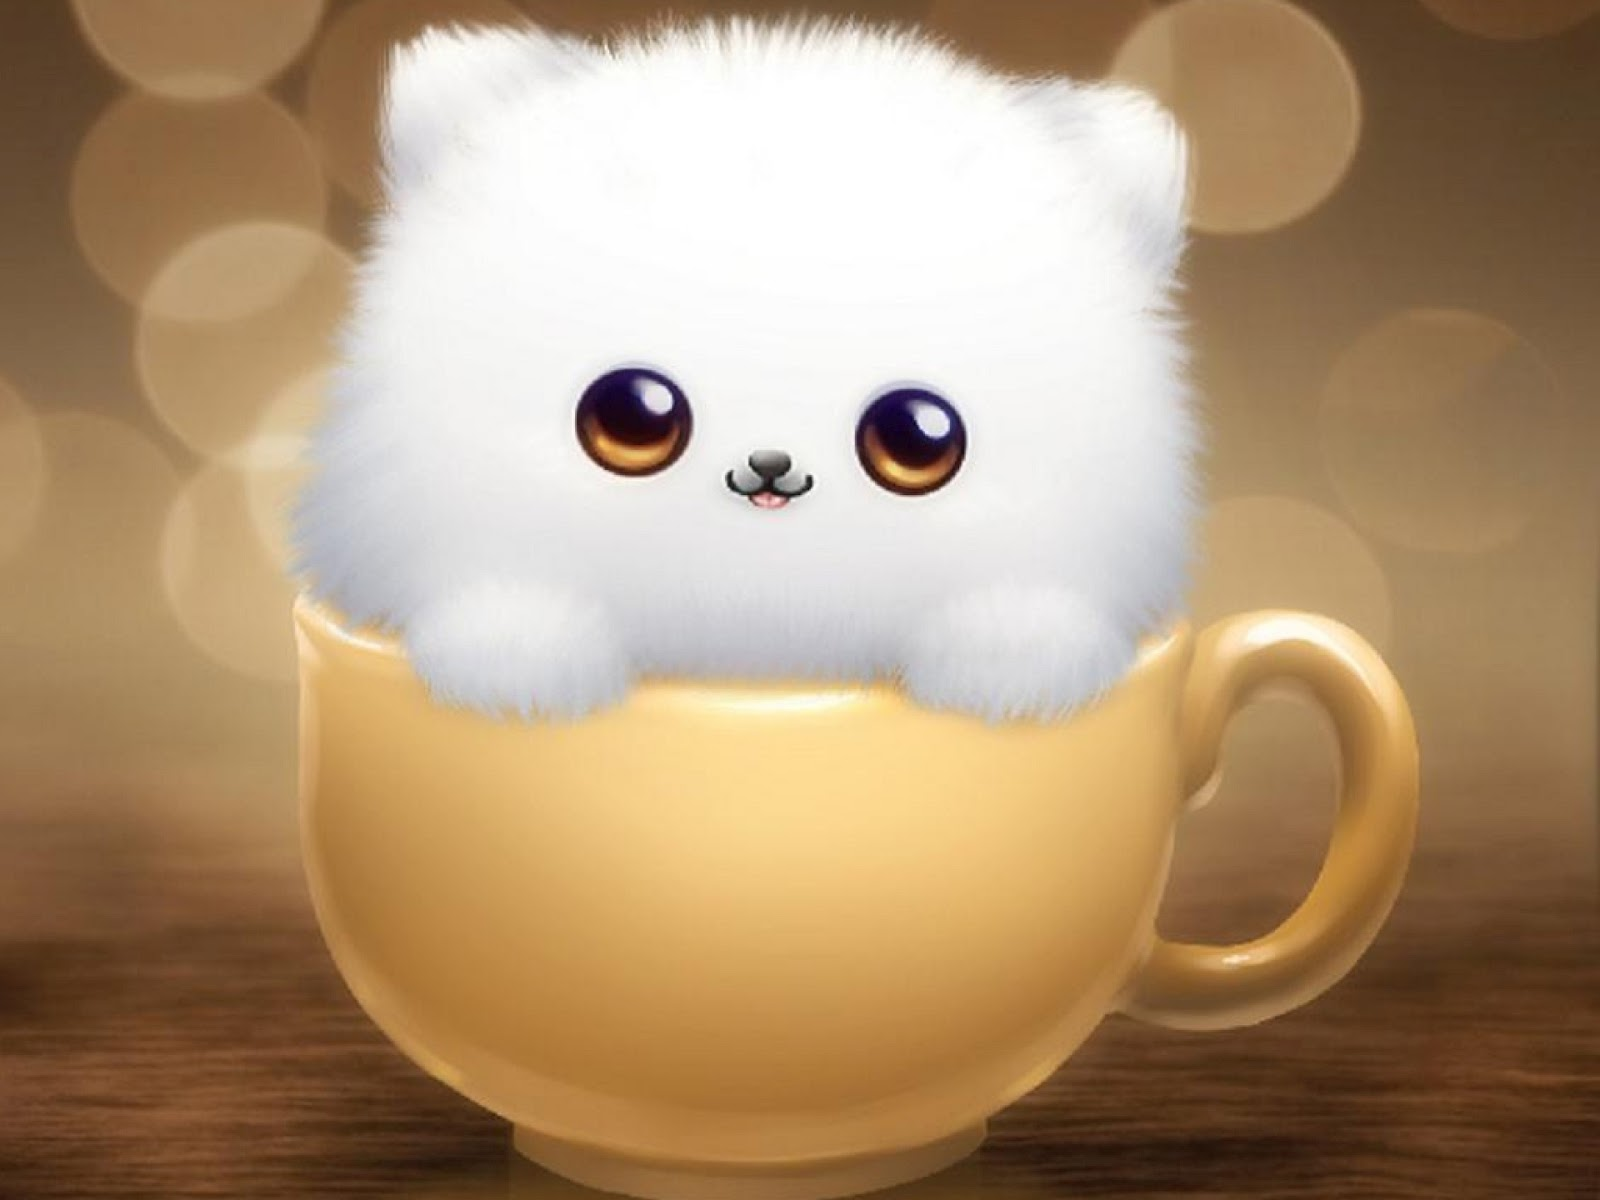 Wallpaper Kucing Imut Lucu Gambar Kartun Lucu Dan Wallpaper Keren